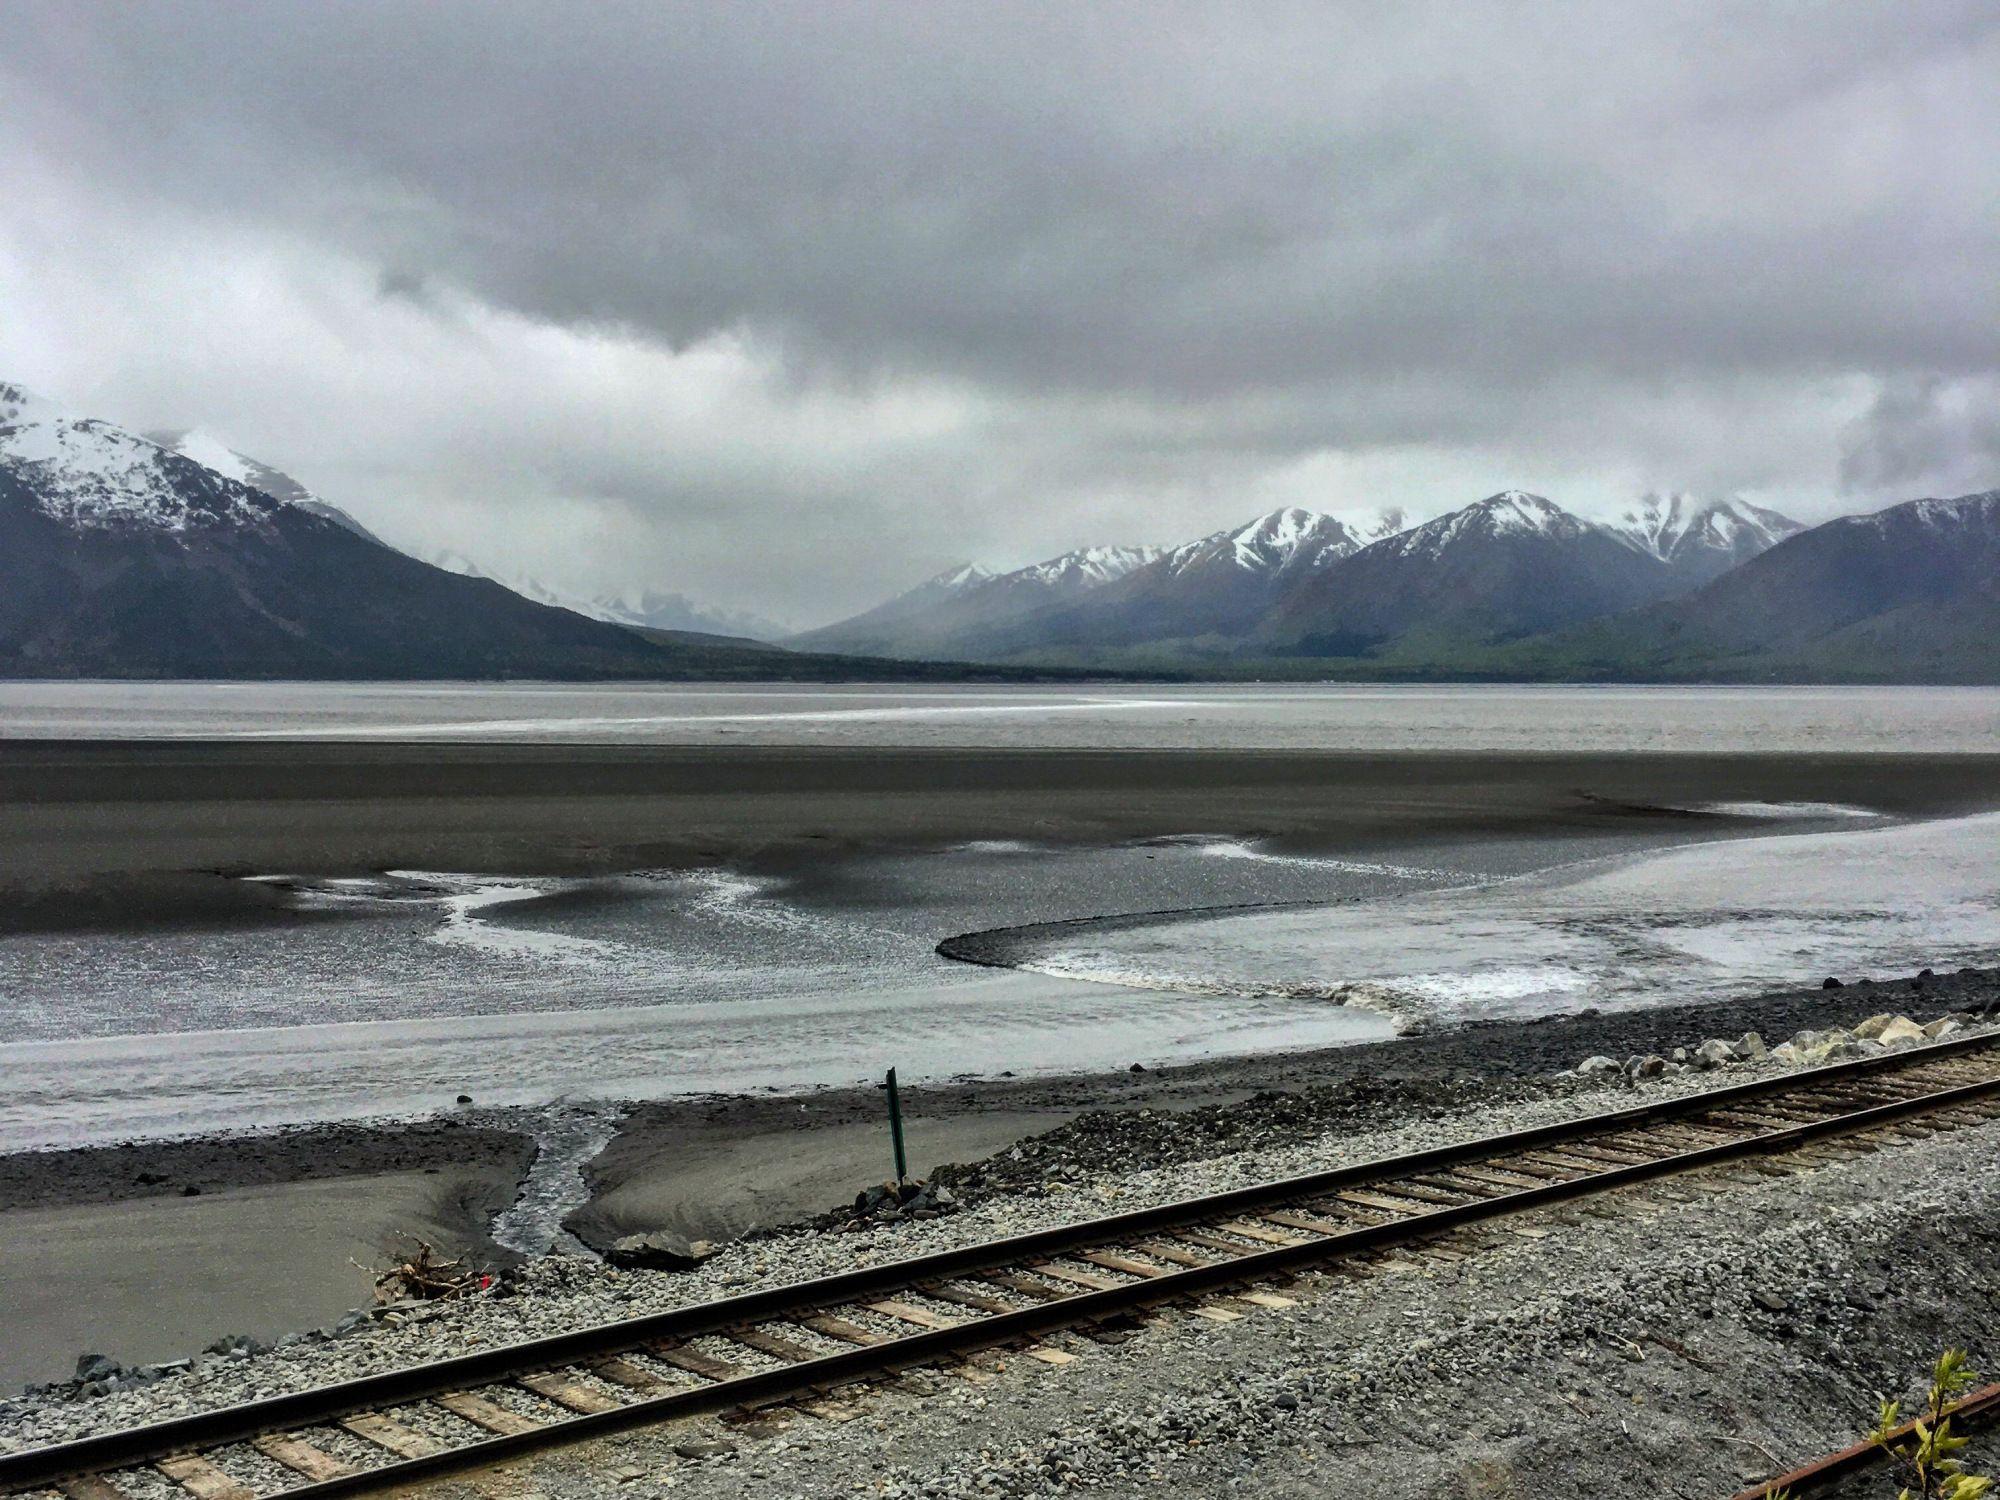 Bore Tide at Falls Creek trailhead – Seward Highway, Anchorage, Alaska – brittanytravelPT